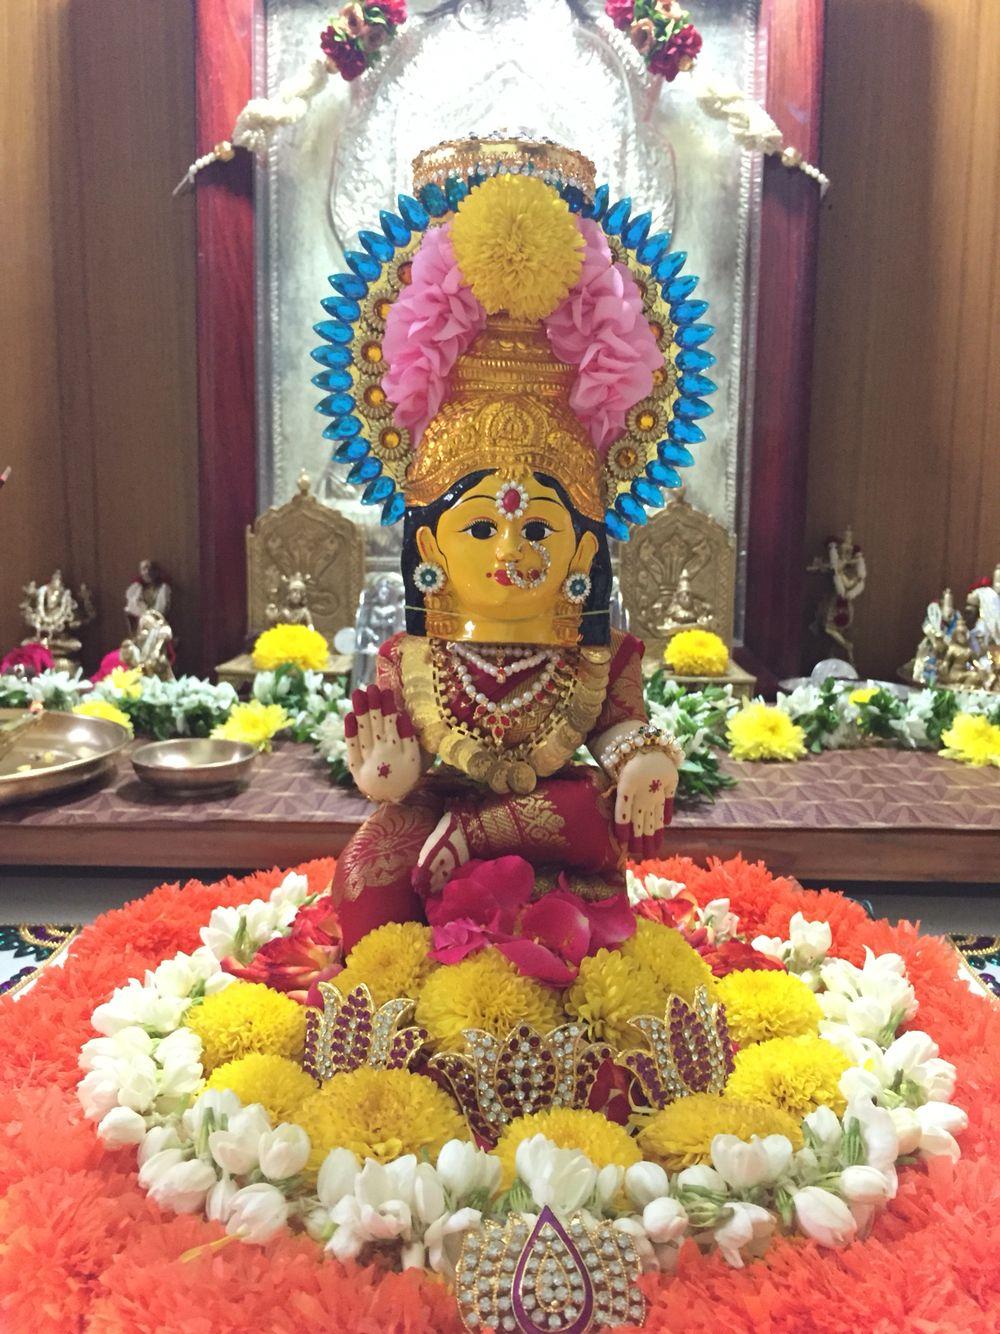 Flower Decorations House Decorations Pooja Mandir Indian